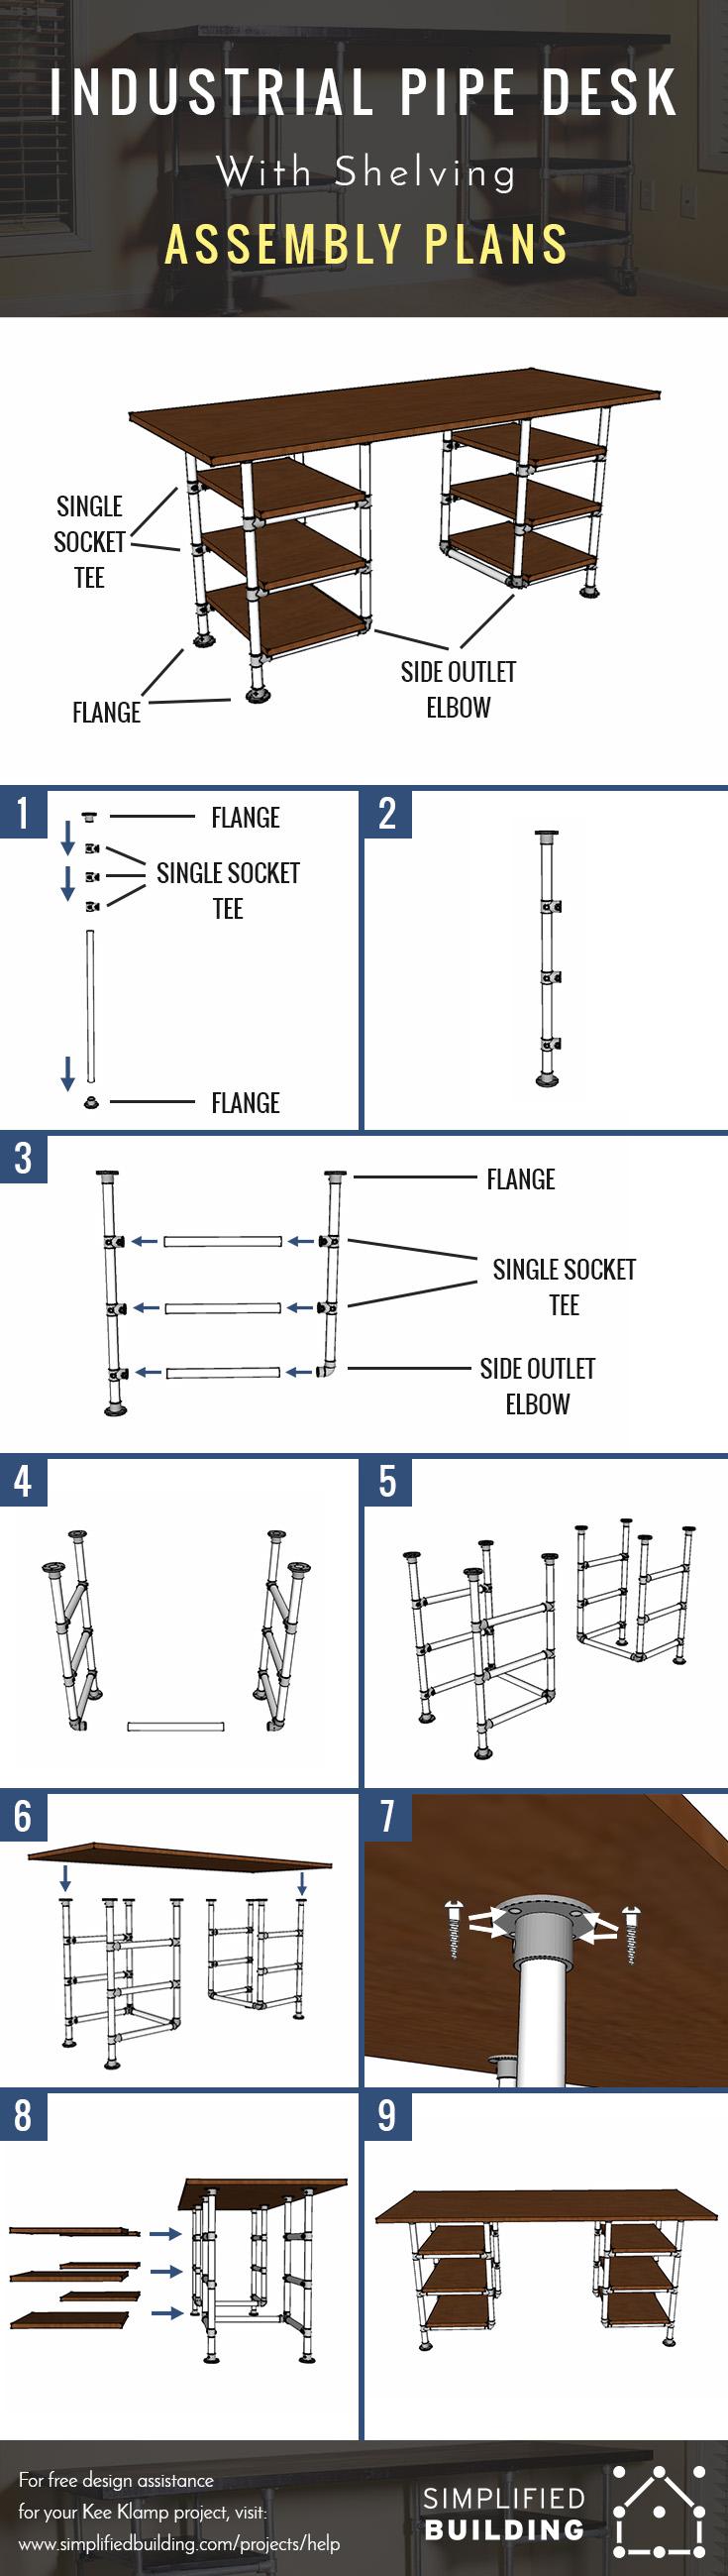 Industrial Pipe Desk Plans